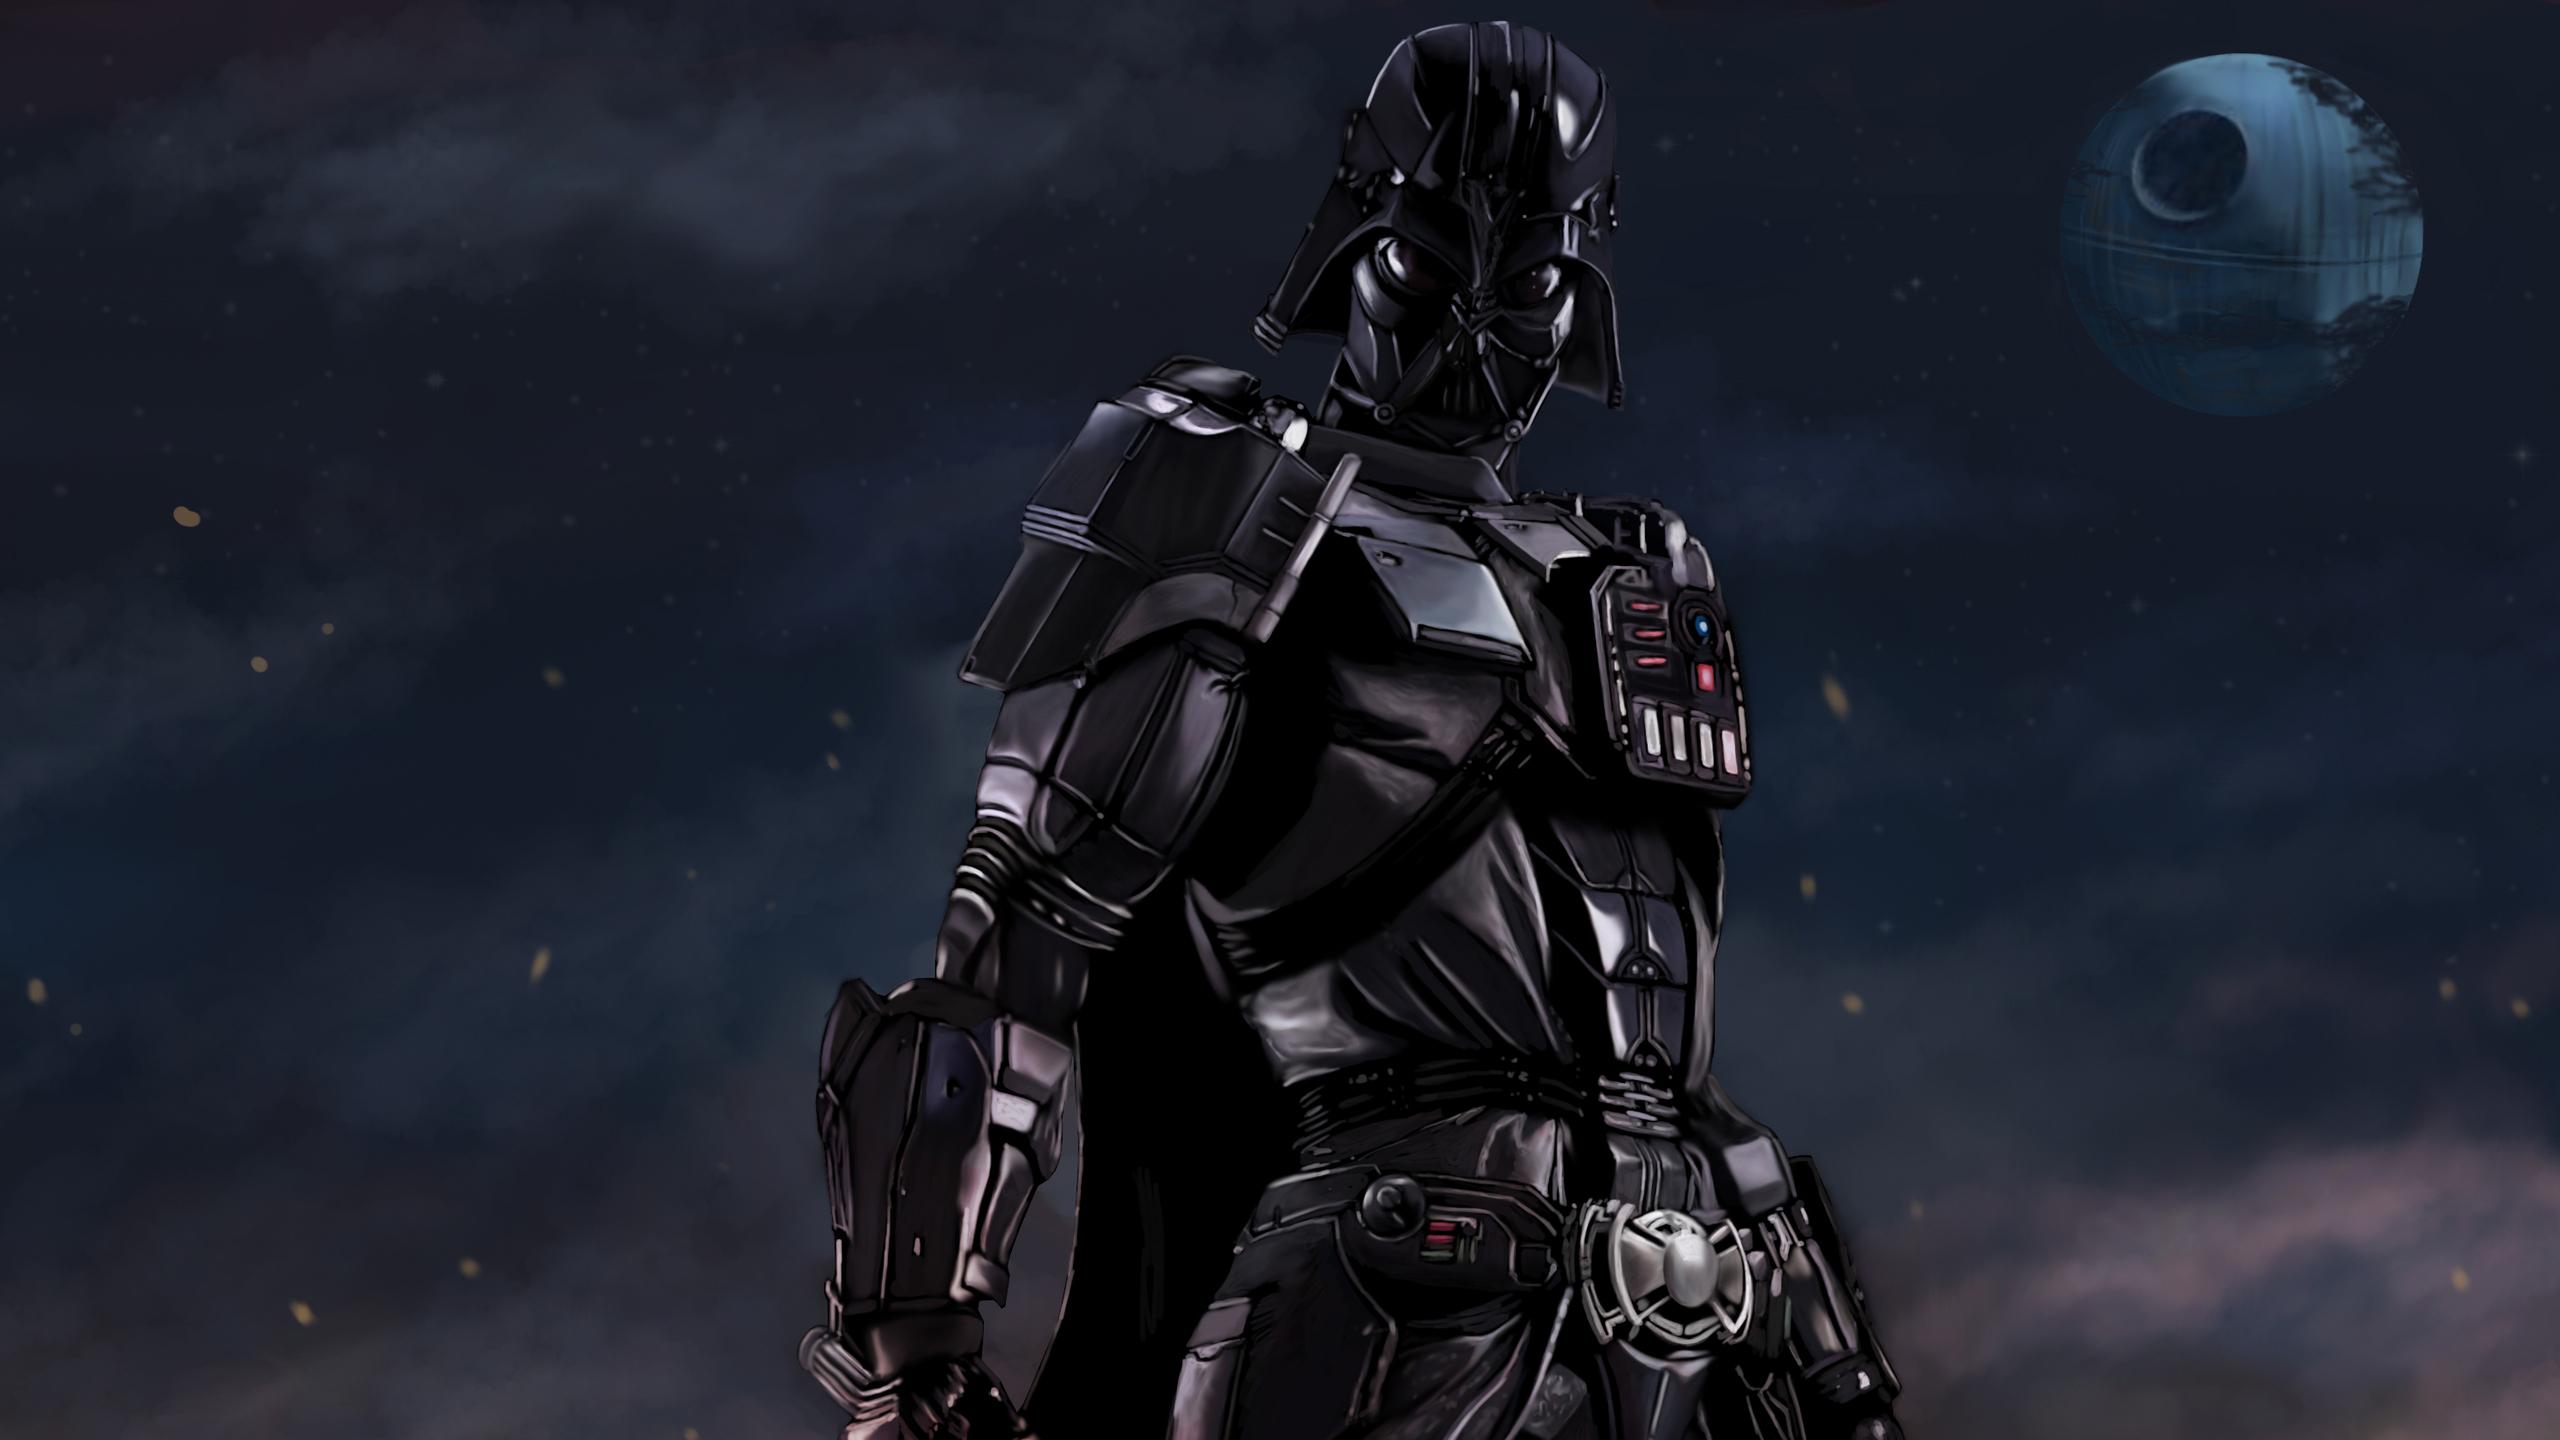 2560x1440 Darth Vader Imperial Artwork 1440P Resolution HD ...